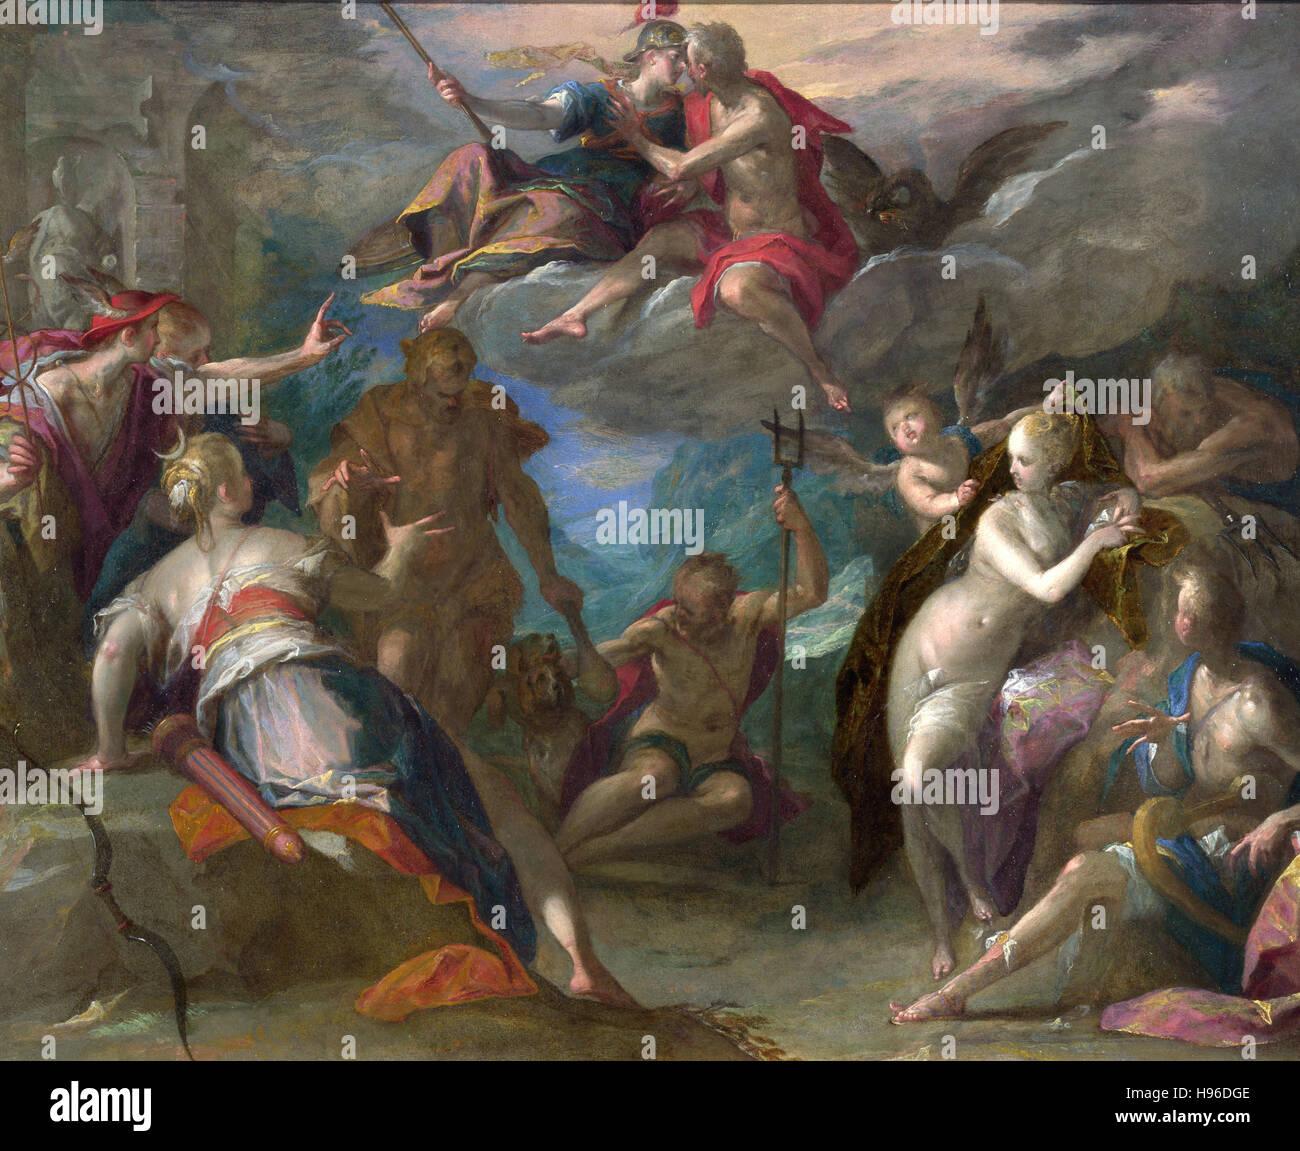 HANS VON AACHEN - The Amazement of the Gods - Stock Image